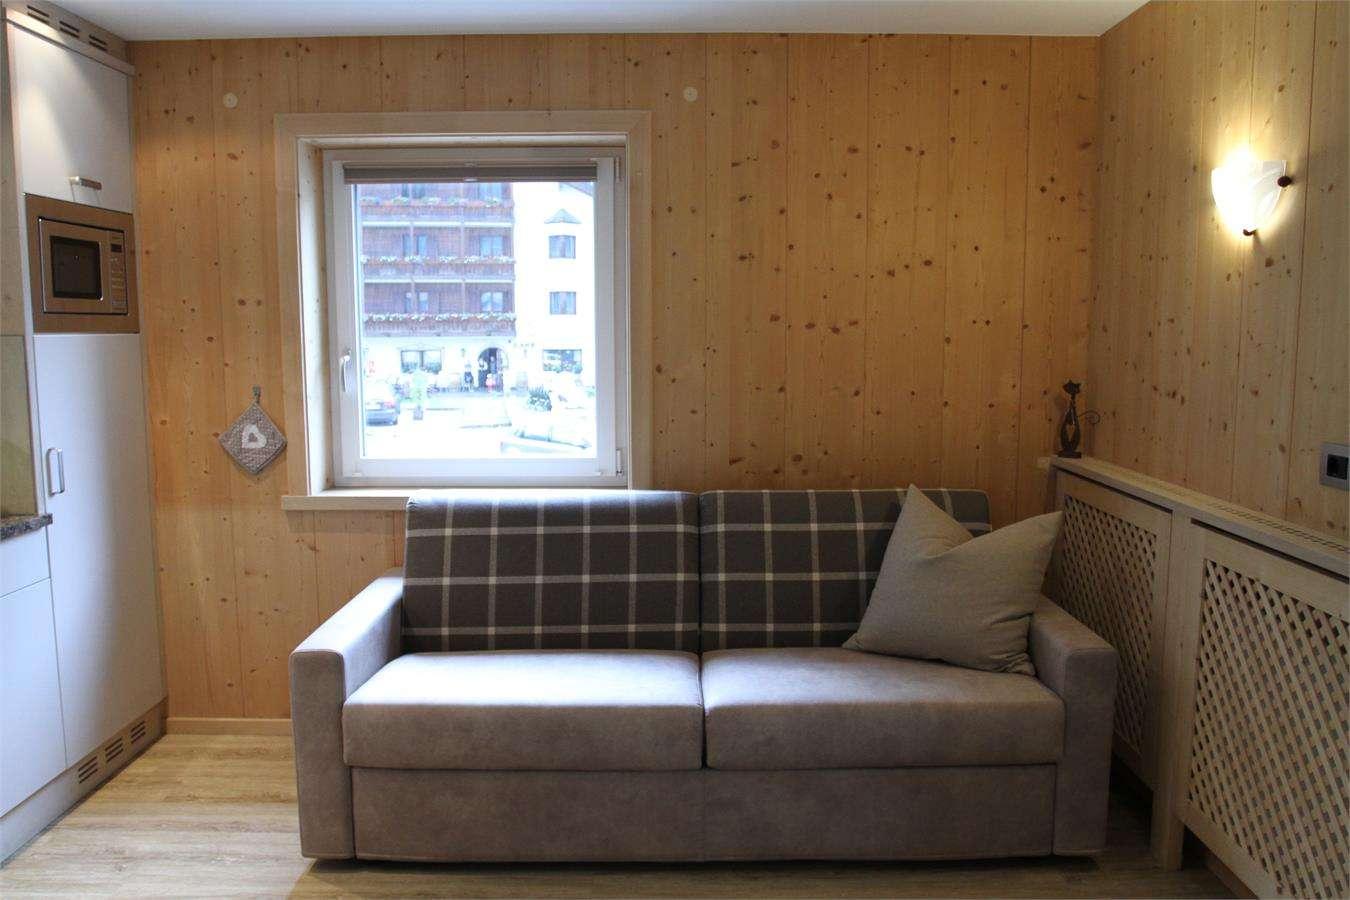 bettsofa fr 2 personen trendy fr jeden tag sofadepot im ganzen schlafsofa personen with. Black Bedroom Furniture Sets. Home Design Ideas